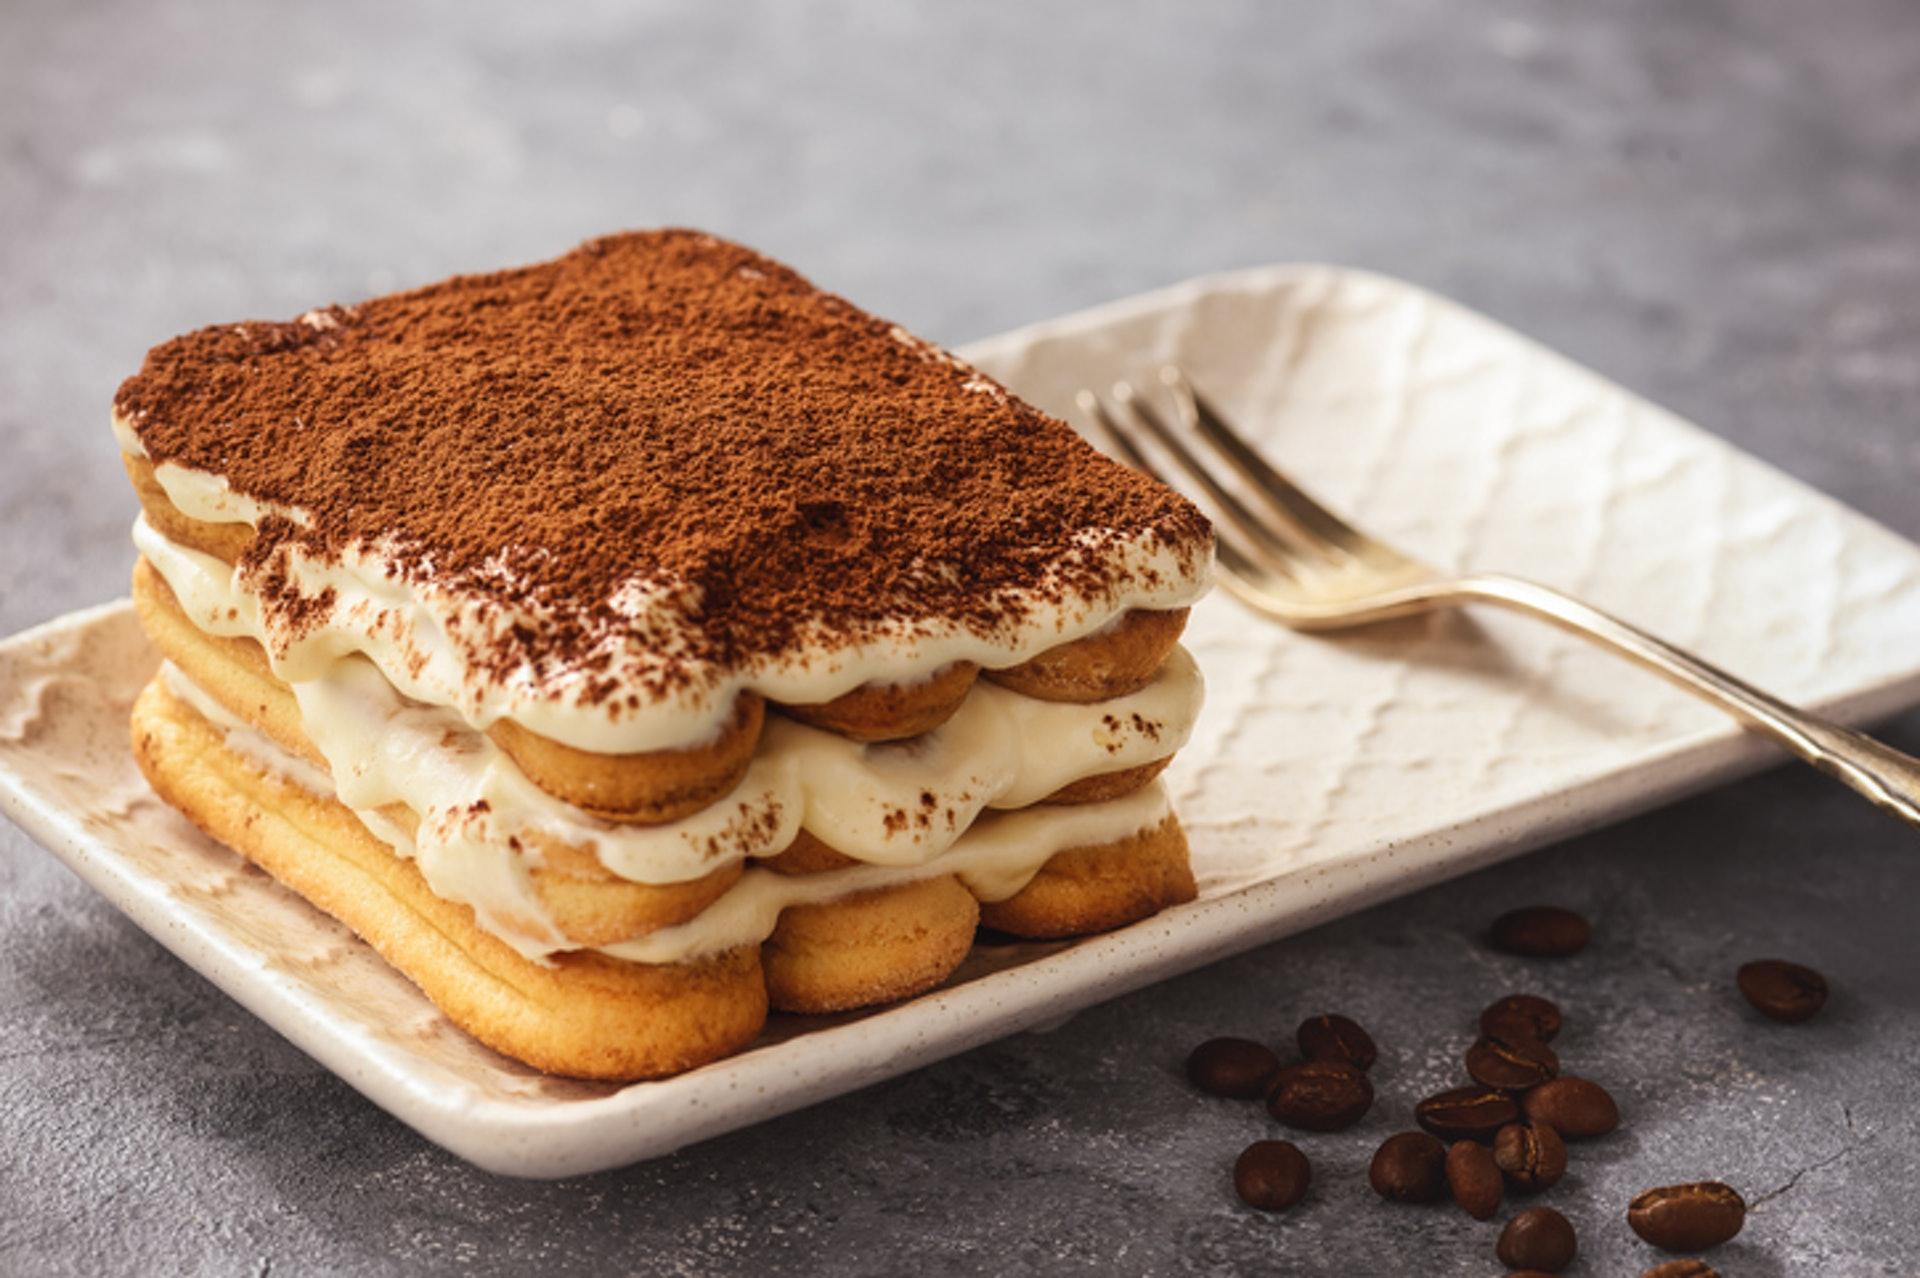 1.【Tiramisu】(最高卡) Tiramisu看似輕盈,但卡路里其實比一般蛋糕高,其主要材料有脂肪含量較高的意大利軟芝士(Mascarpone cheese)、淡忌廉、砂糖,再加上經酒精浸過的手指餅,令熱量大大提升。(GettyImages/VCG)